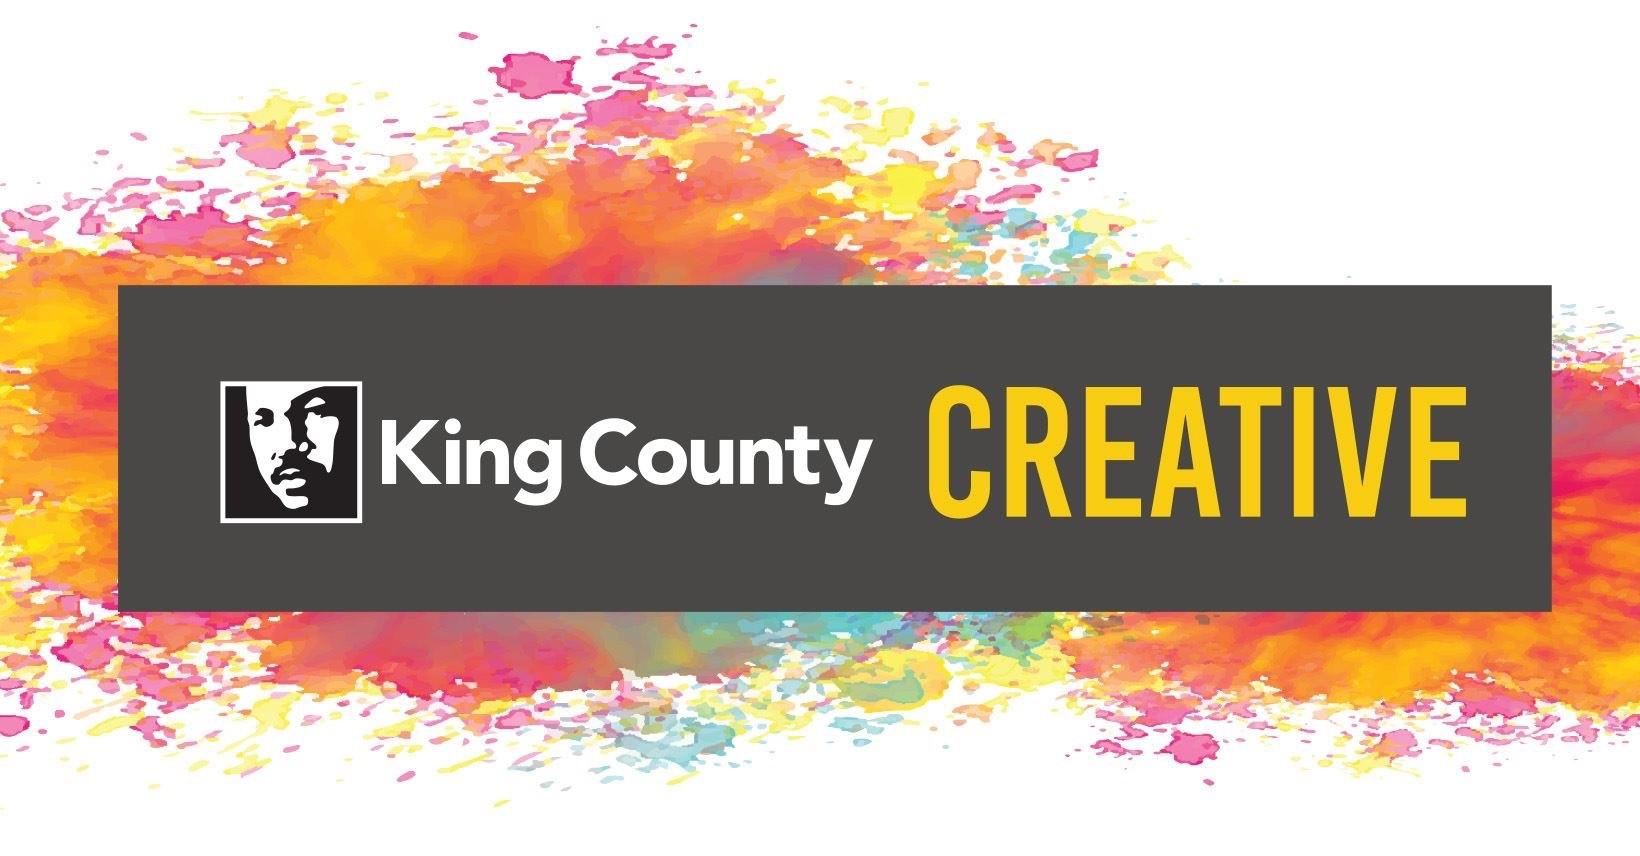 King County Creative logo